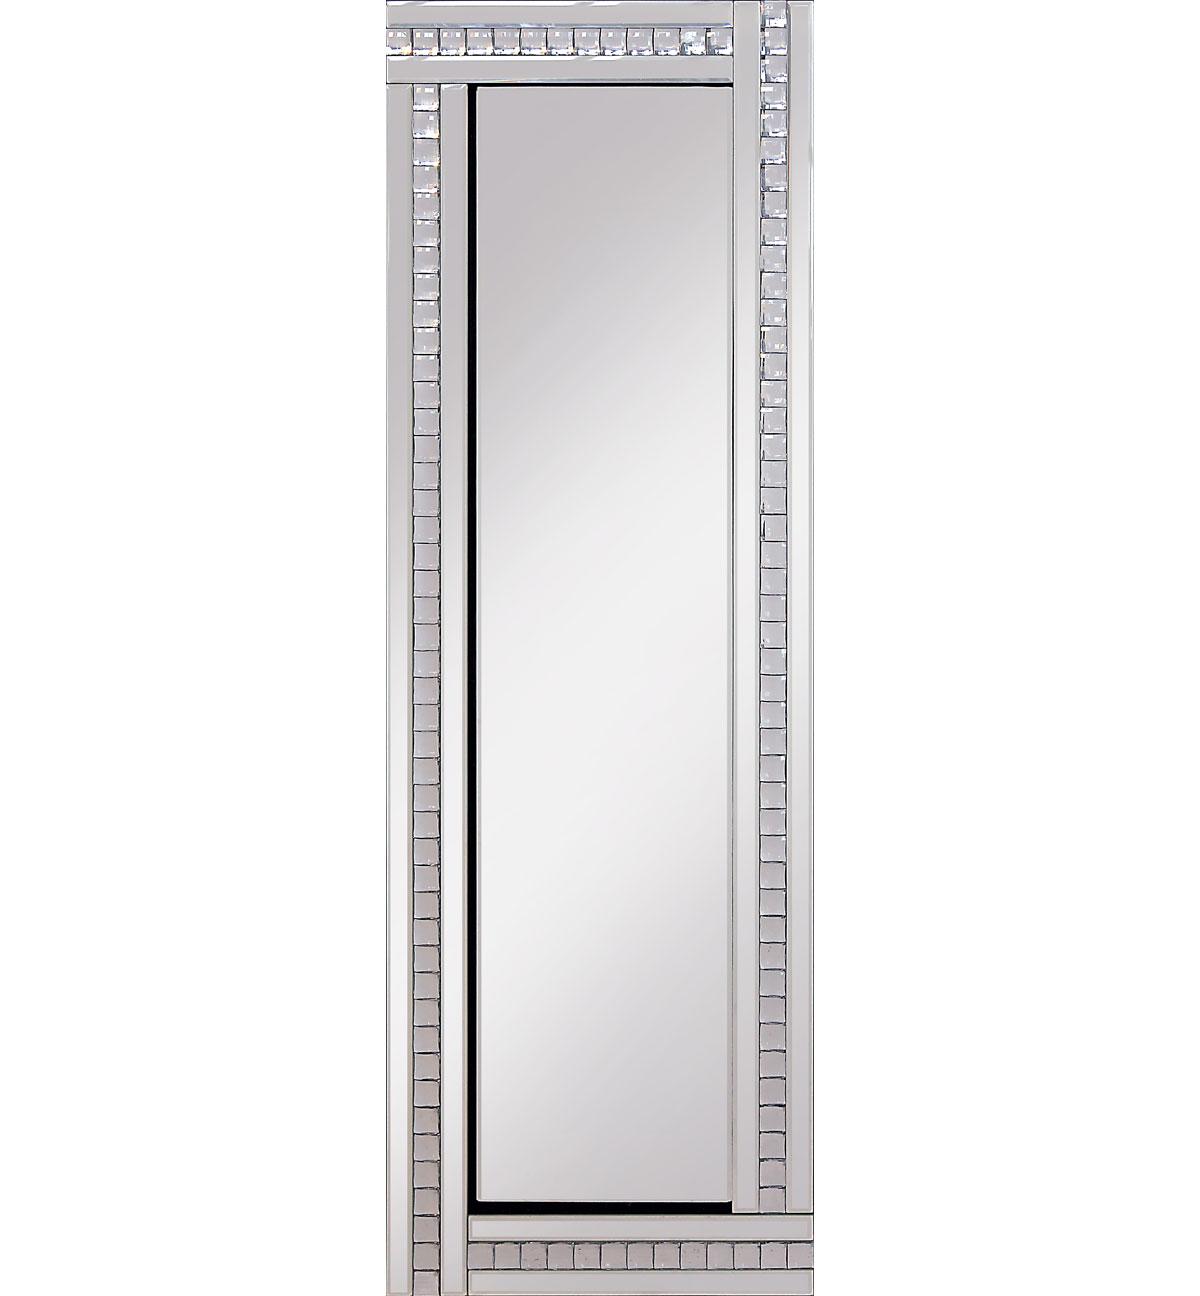 Frameless Bevelled Crystal Border Silver Mirror 120cm X 40cm